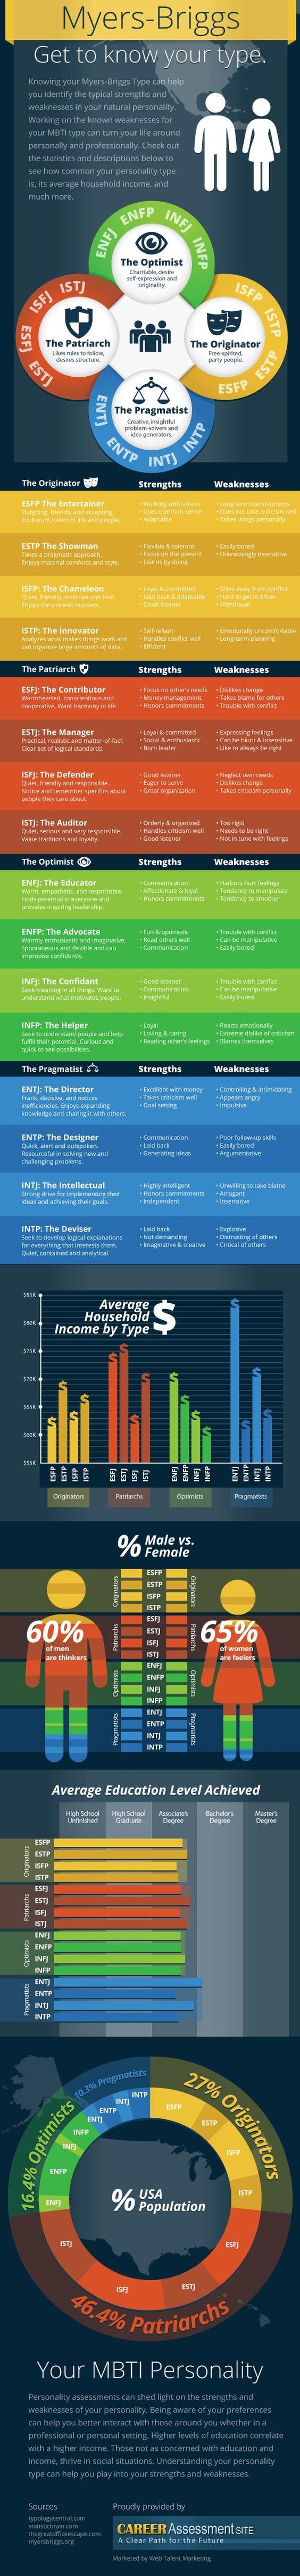 myers briggs infographic